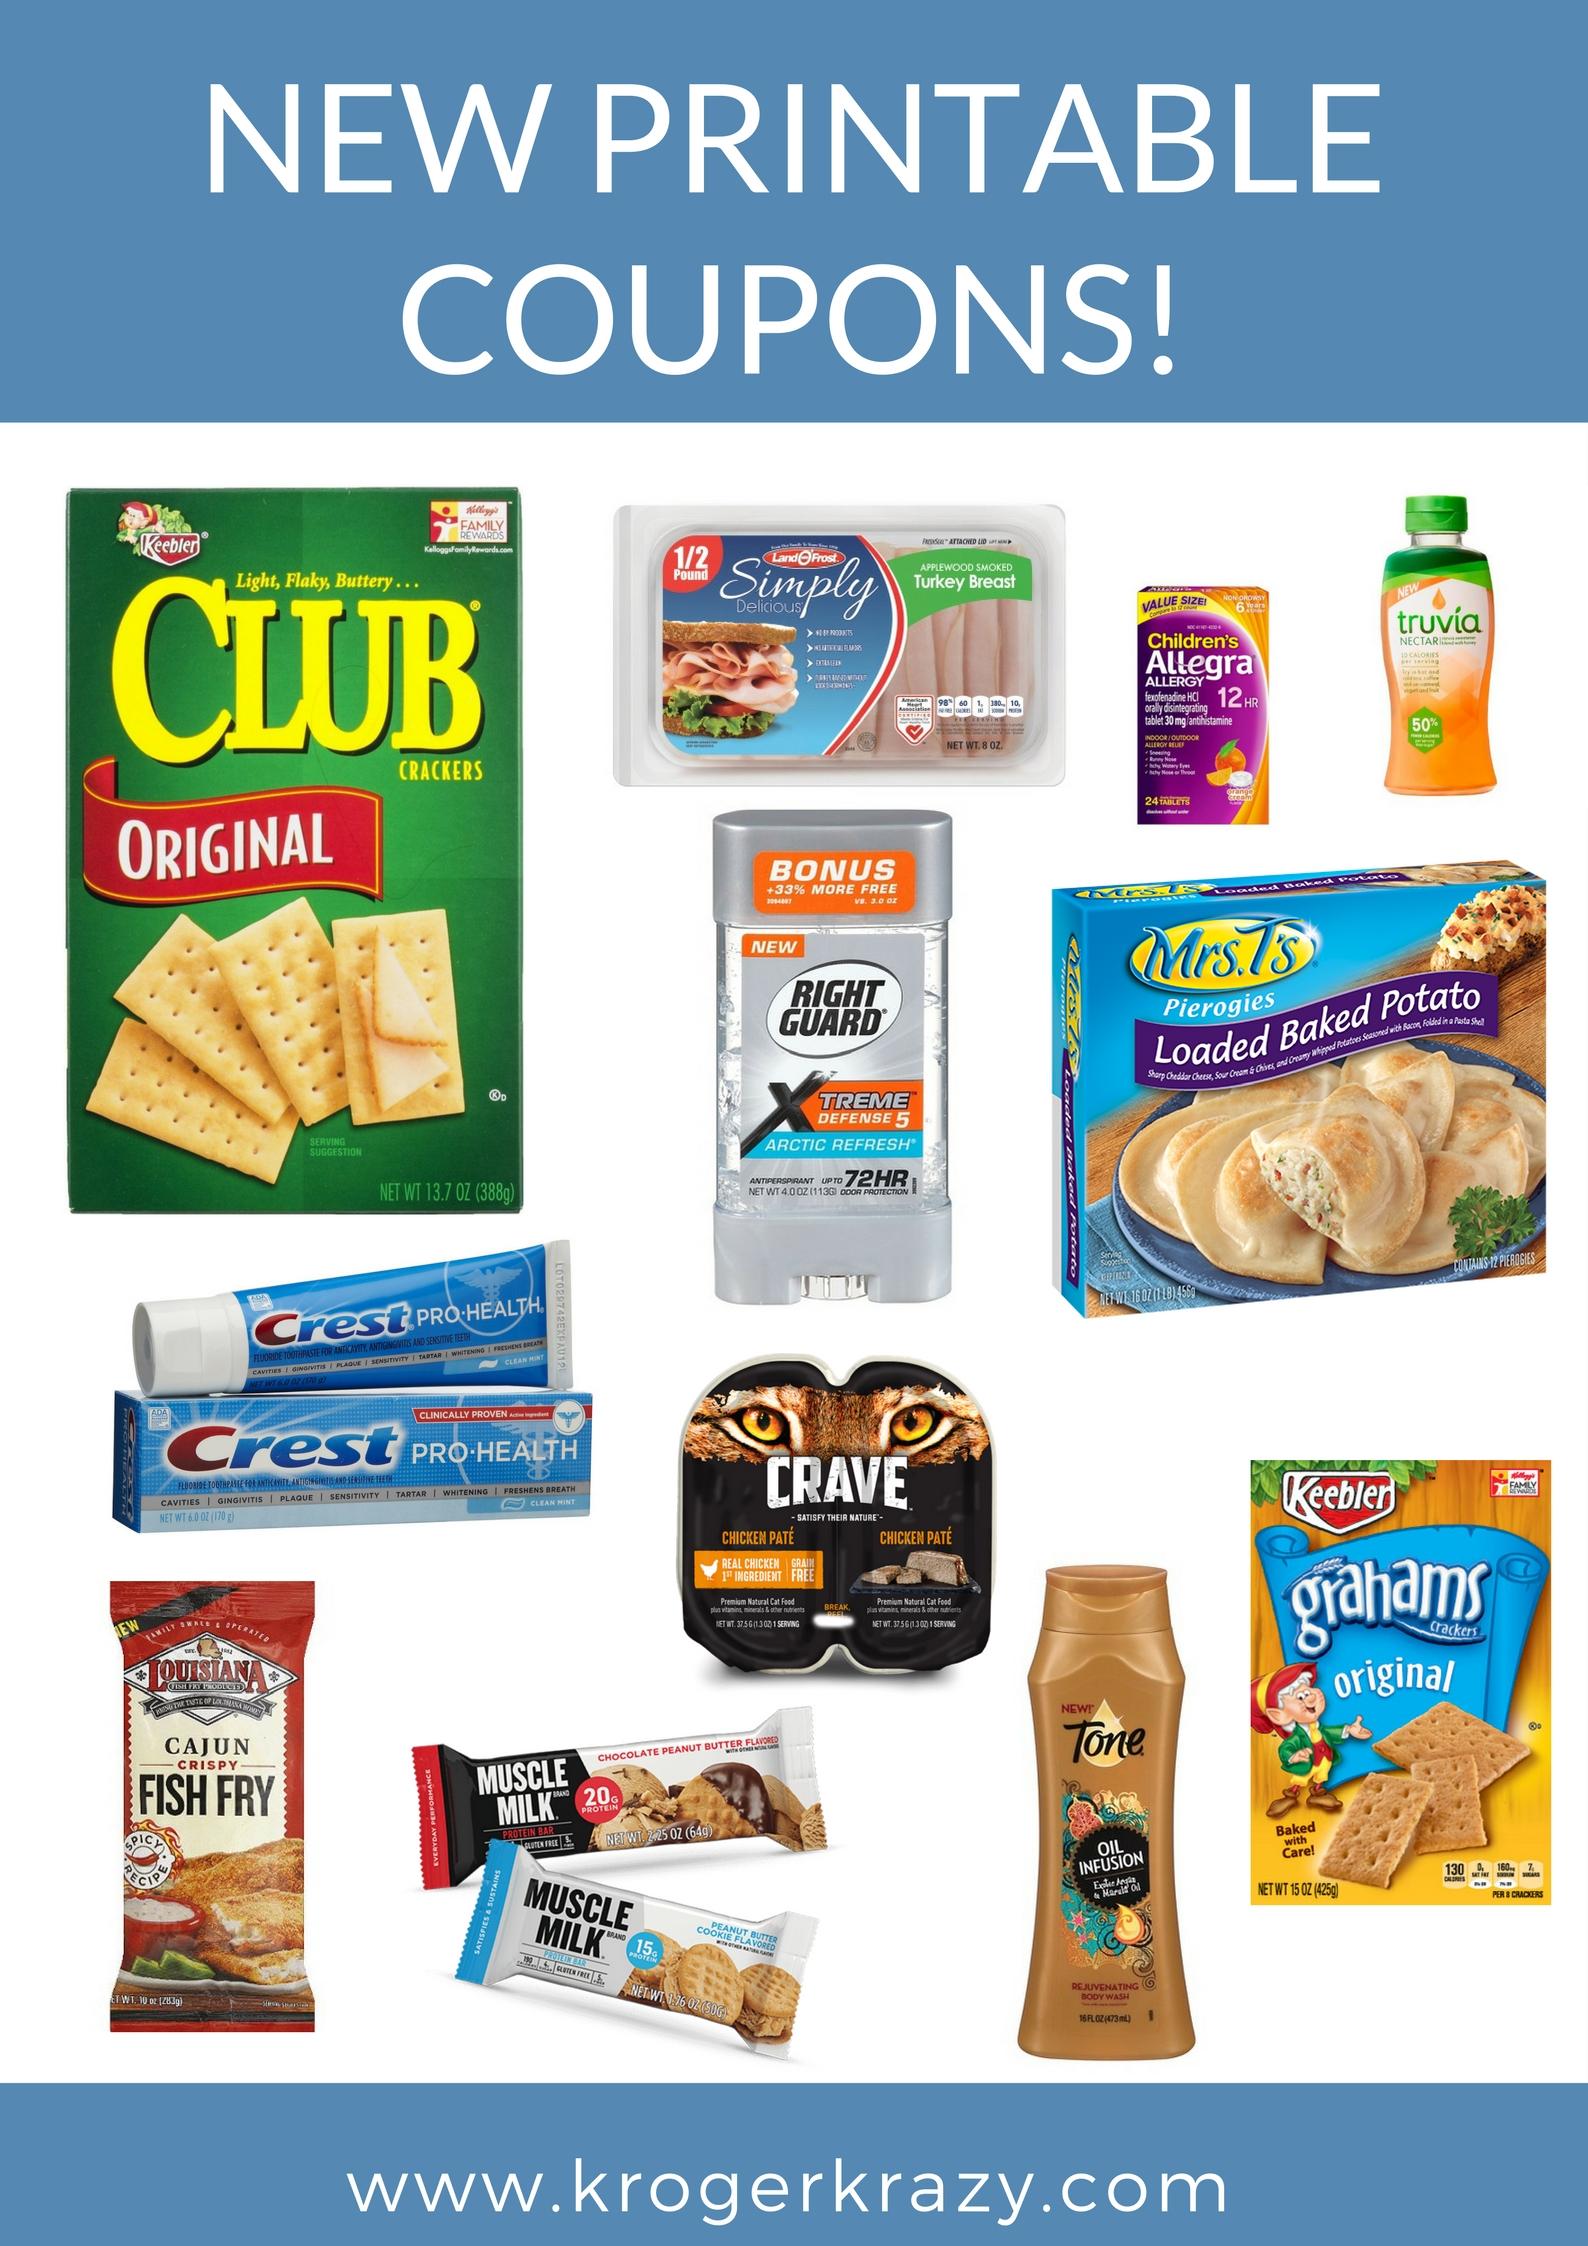 Kroger printable coupons